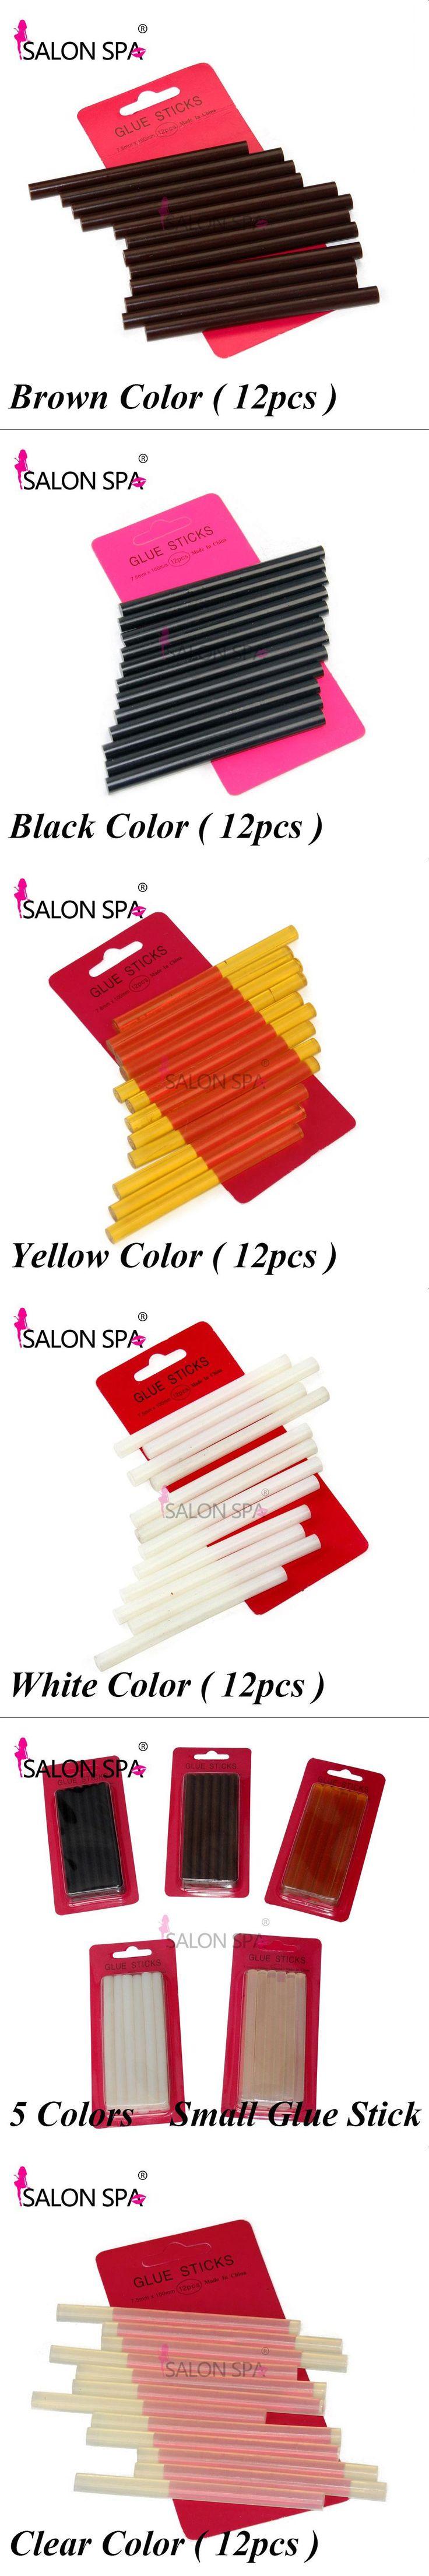 Keratin Glue Sticks 12pc/pack Hot Melt Glue Sticks 10mm*7mm Professional Hair Tools 5 Colors For Fusion Keratin Hair Extensions